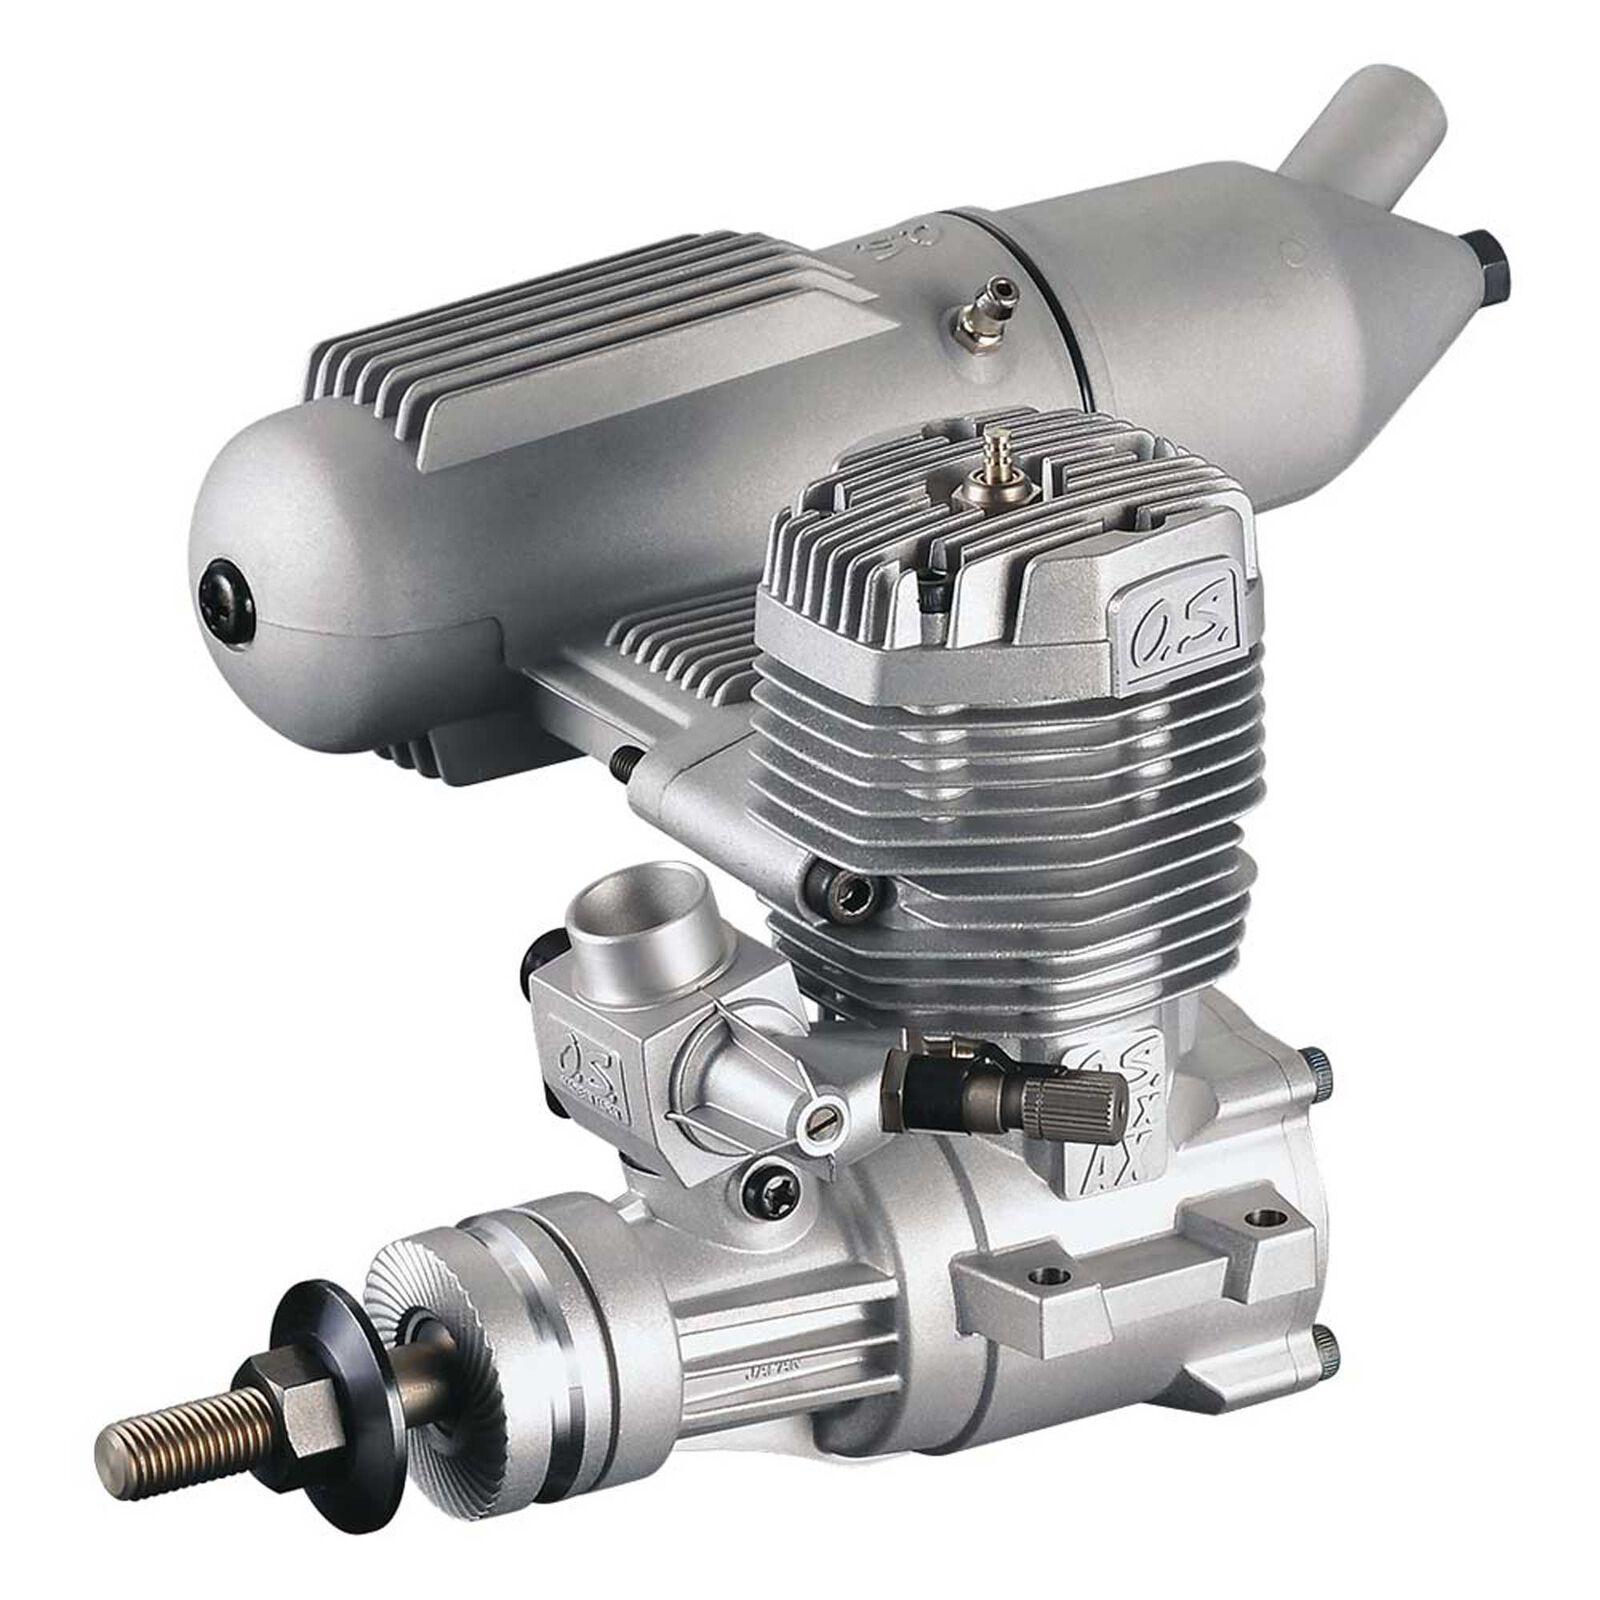 65AX ABL .65 Airplane Glow Engine with Muffler